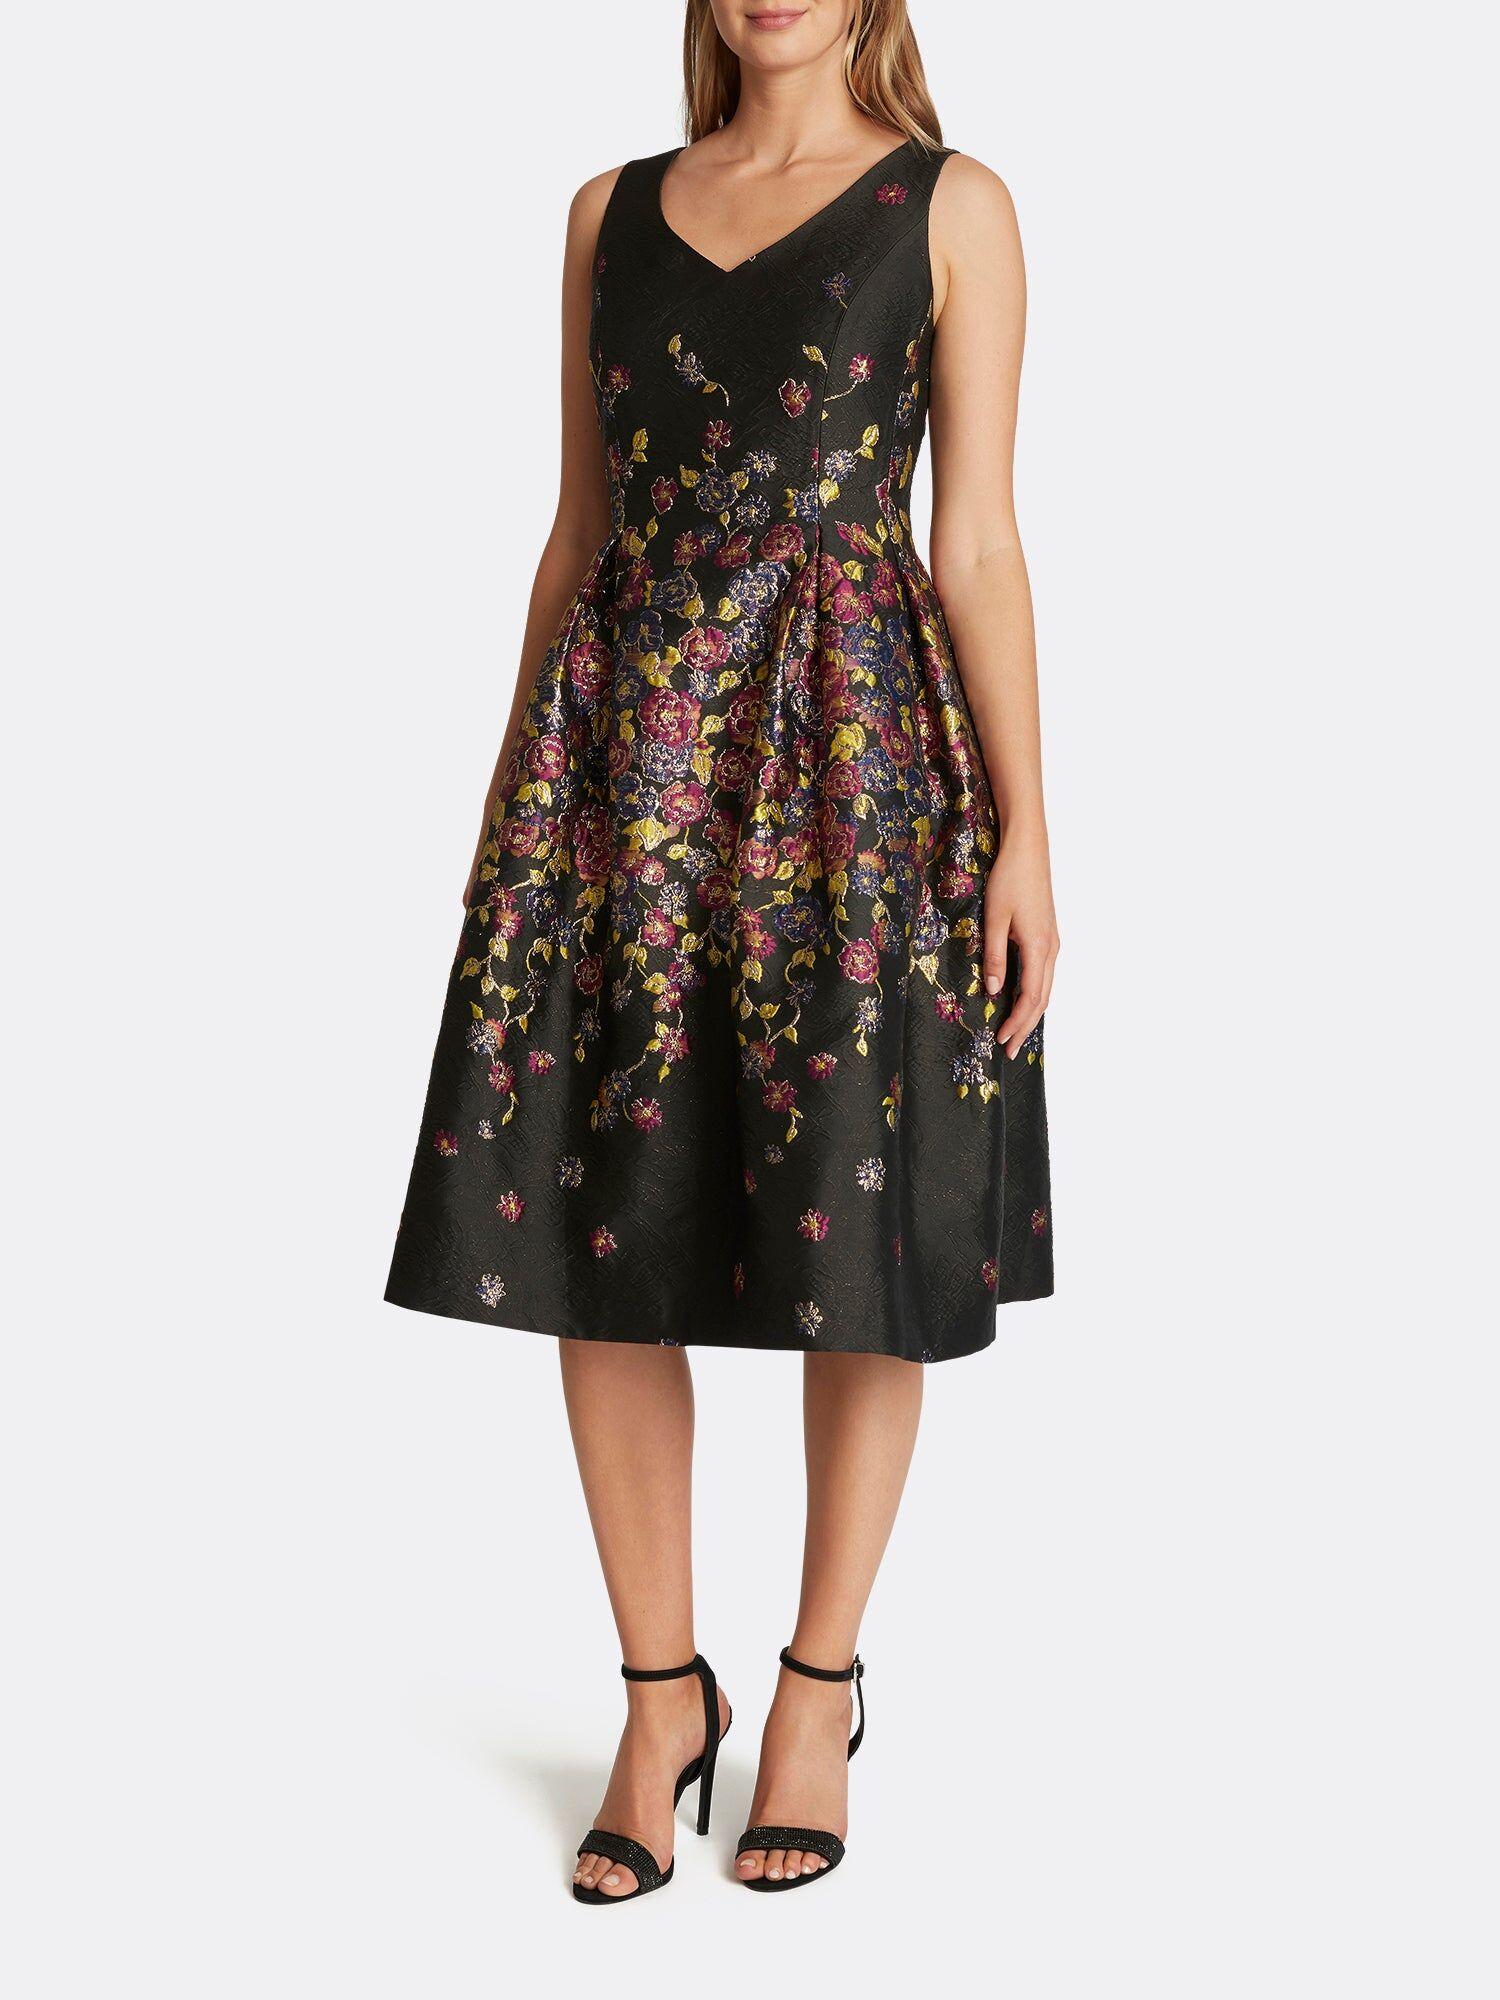 Tahari ASL Lurex Floral Jacquard Midi Dress Black Aster Garden Size: 8